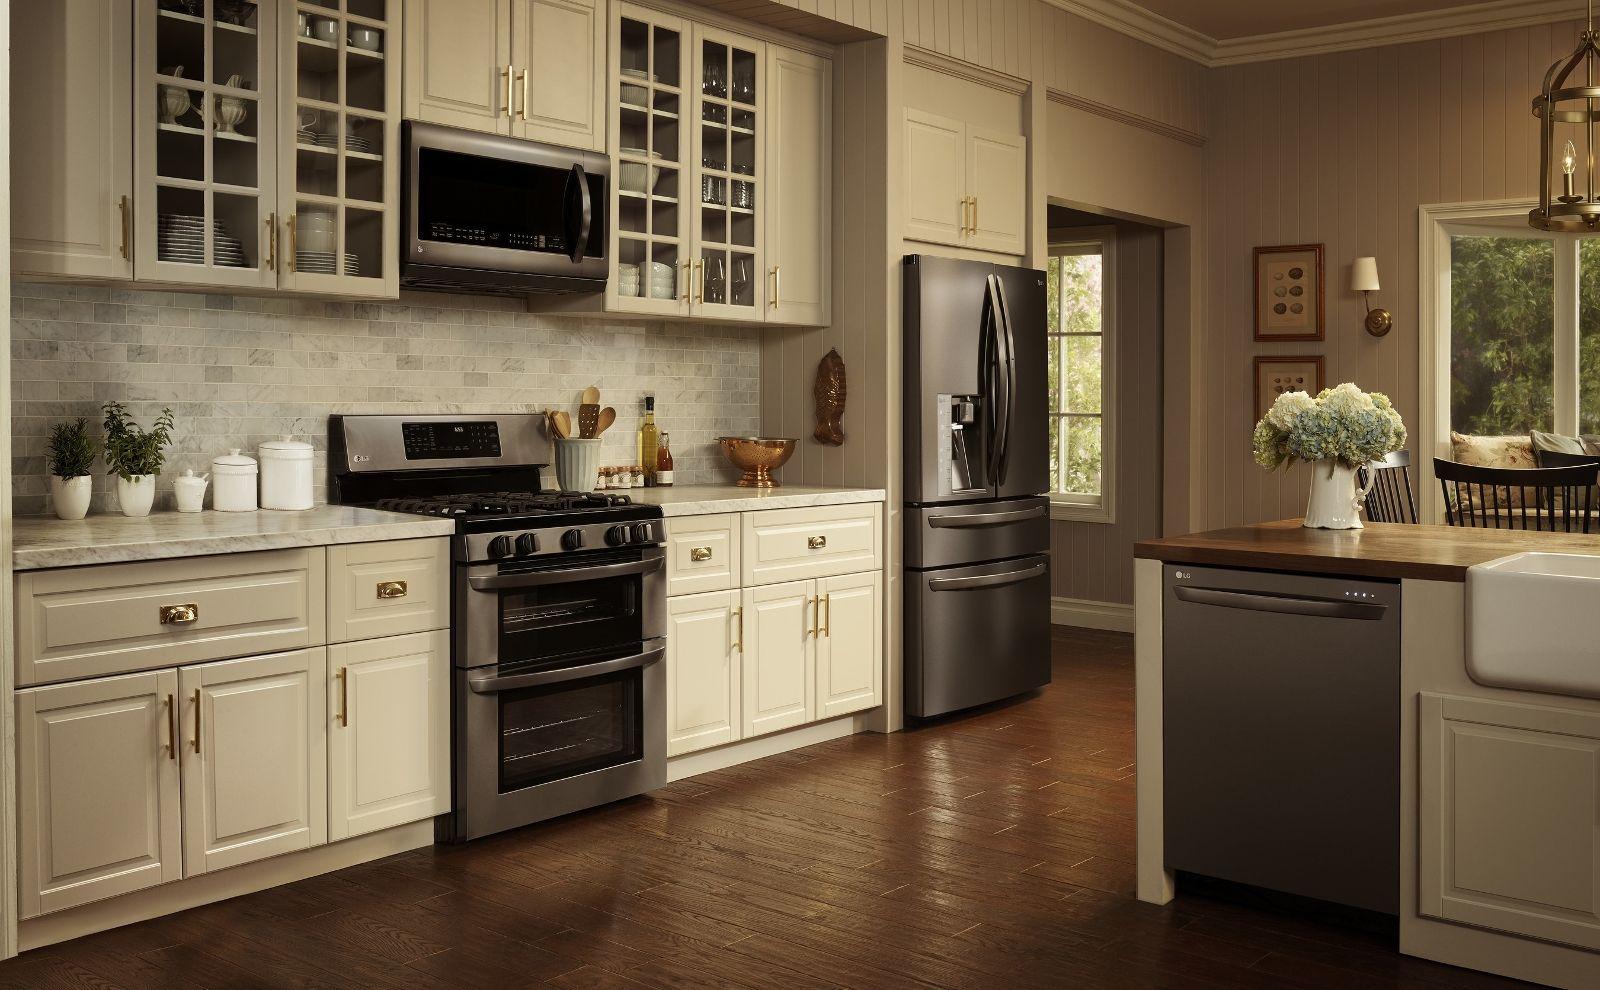 Black Metal Kitchen Cabinets Built In Wine Rack Lglimitlessdesign Contest Lg Stainless Steel